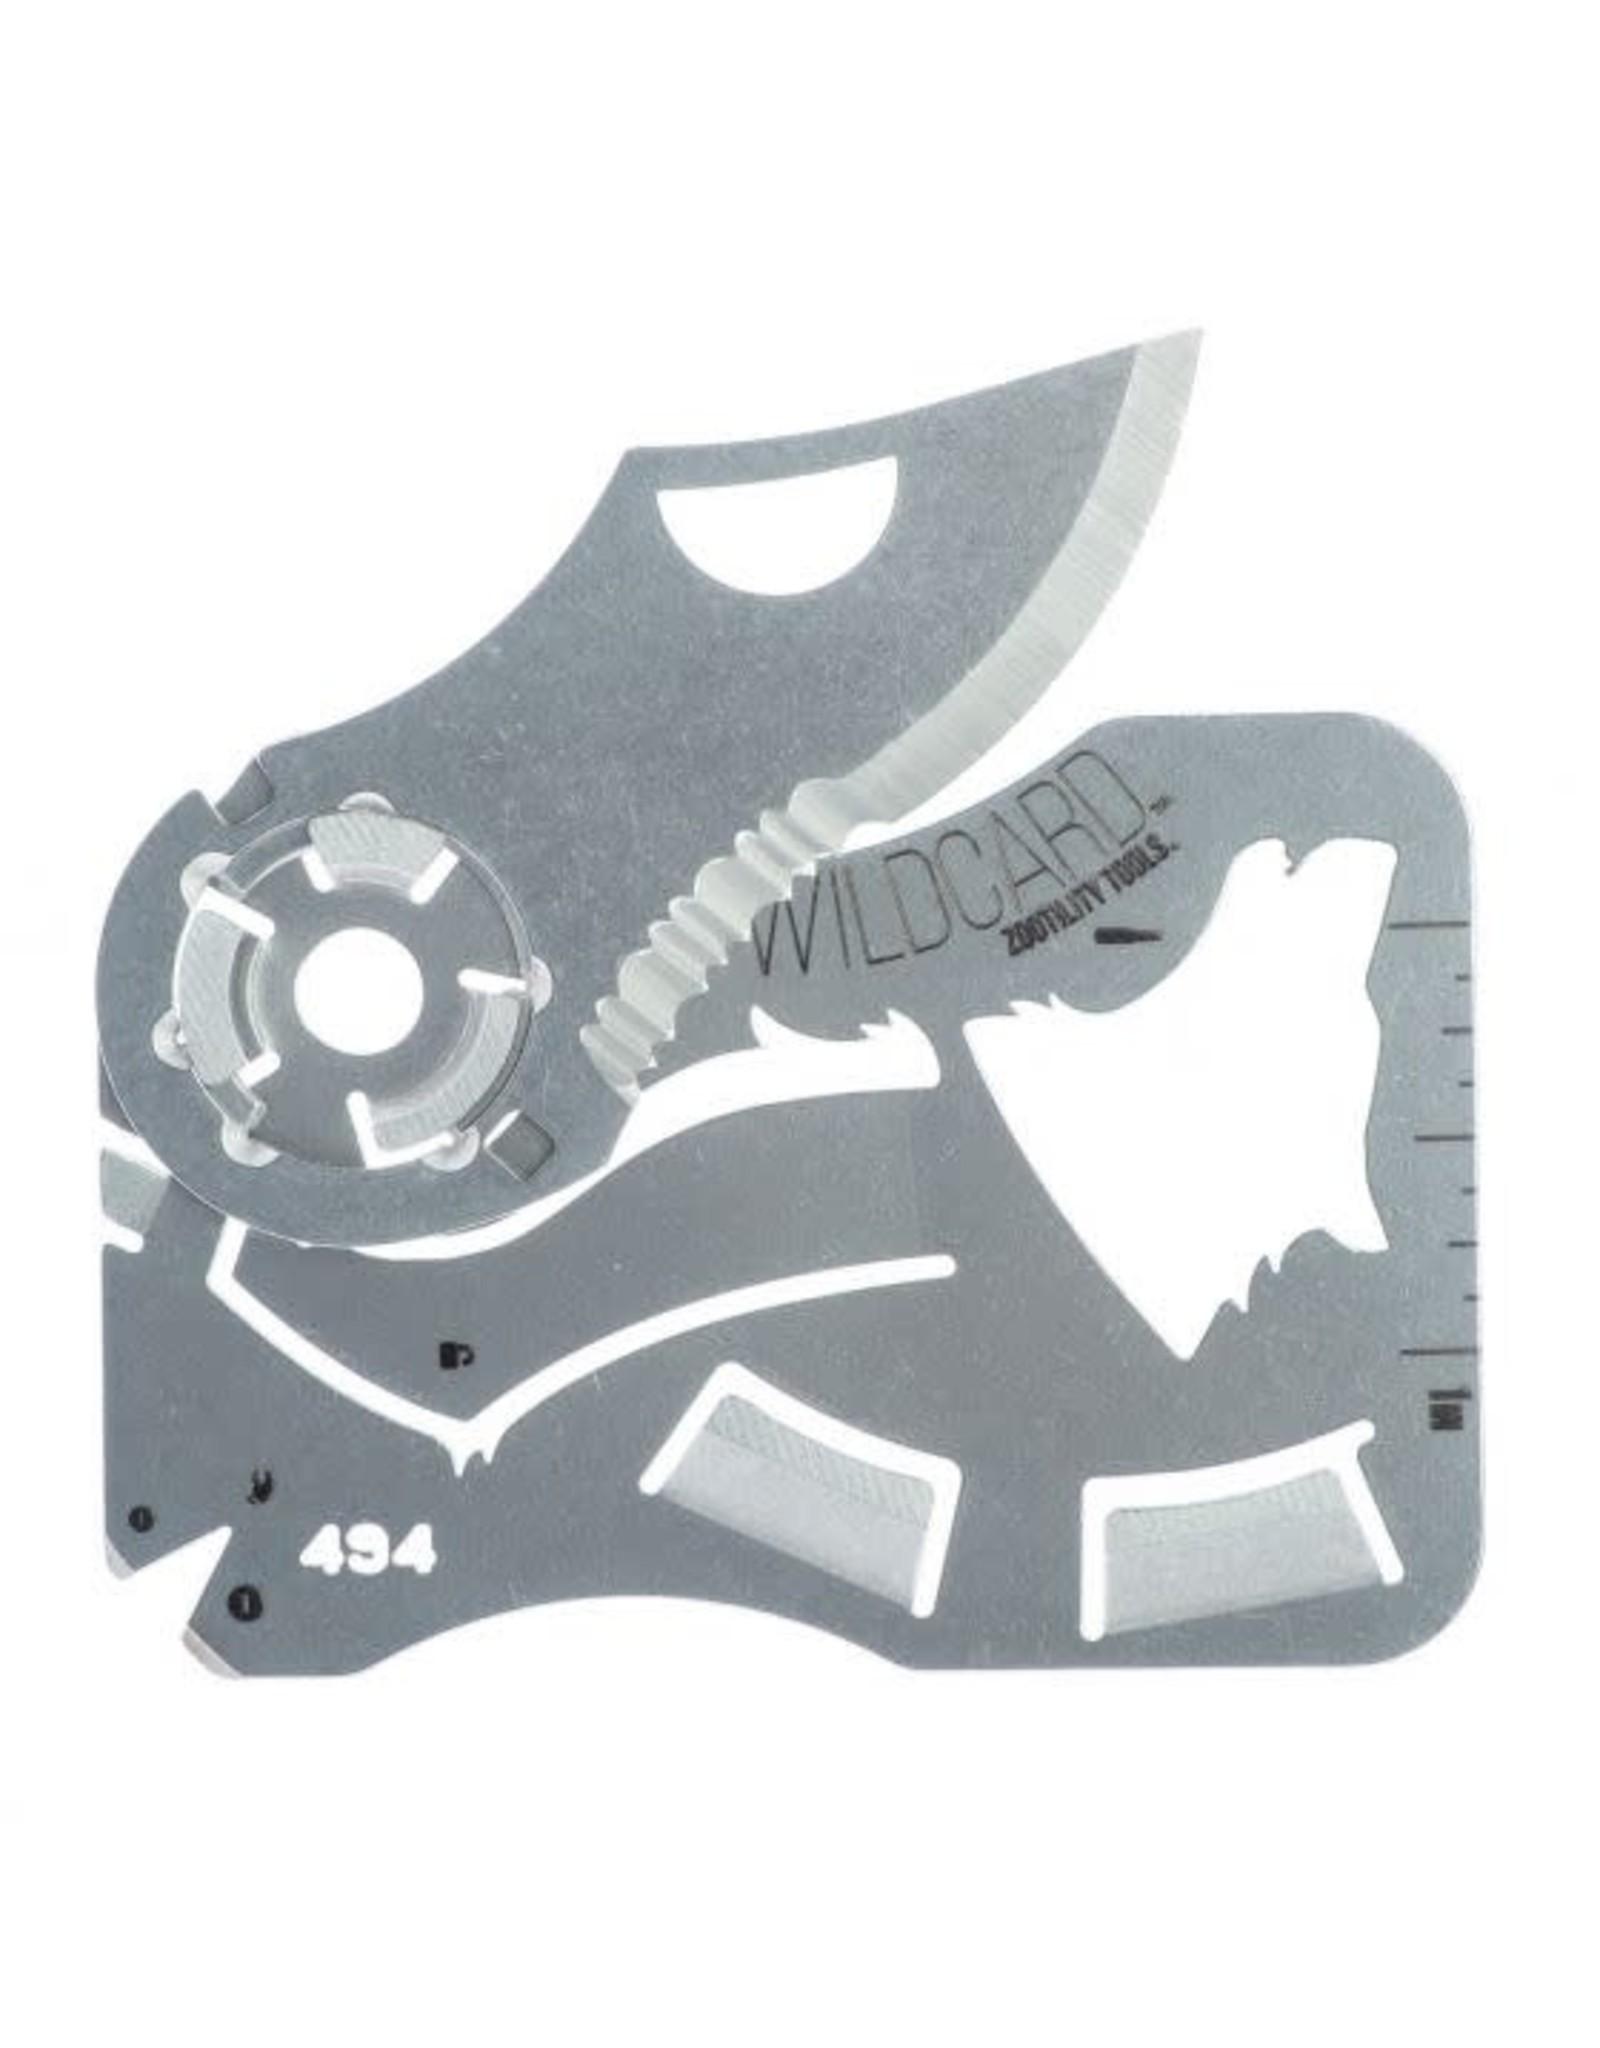 Zootility Wildcard Wallet Knife